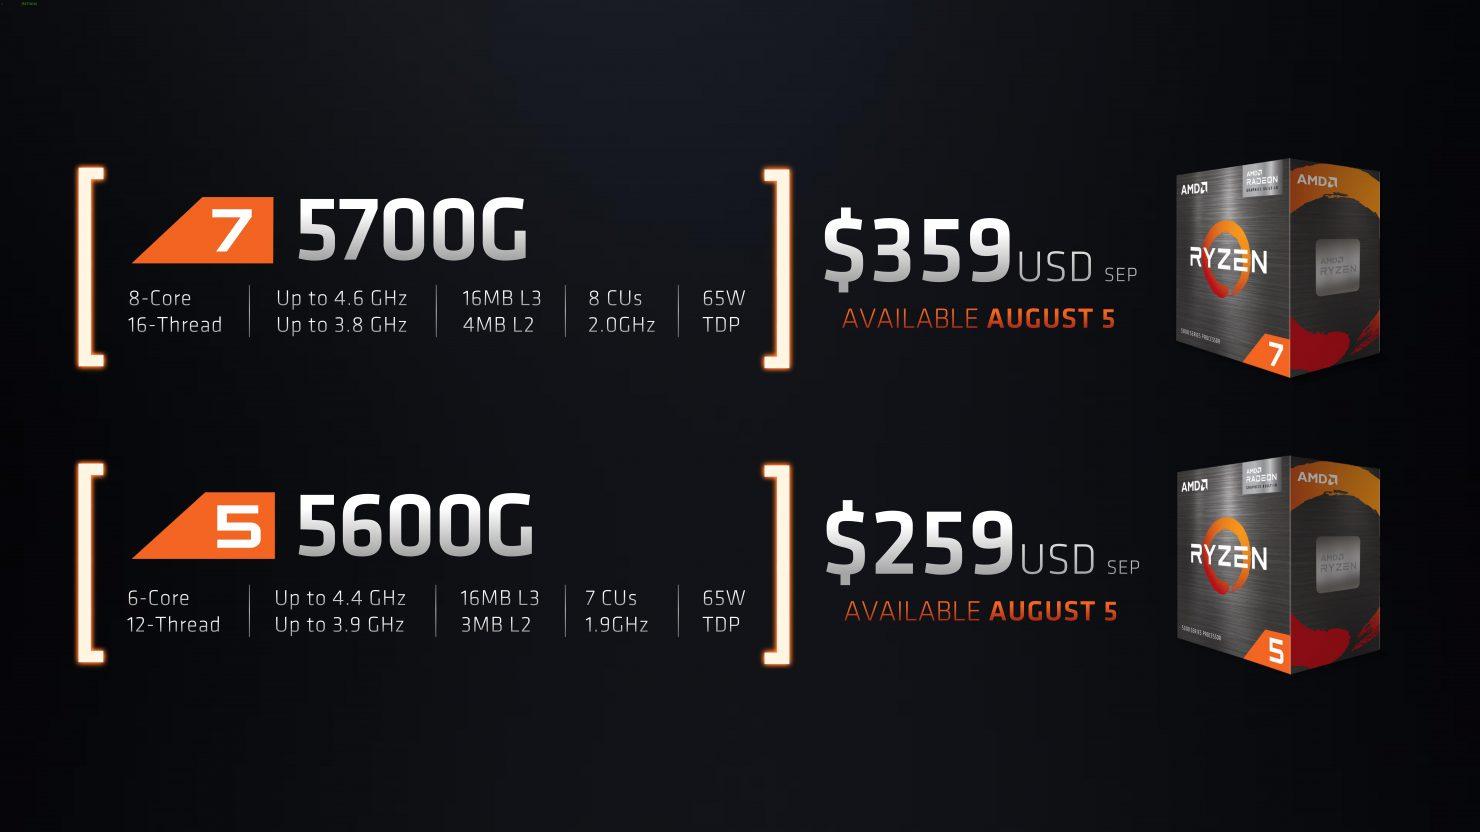 amd-announces-ryzen-7-5700g-&-ryzen-5-5600g-'cezanne'-desktop-apus-for-diy-segment,-launching-on-5th-august